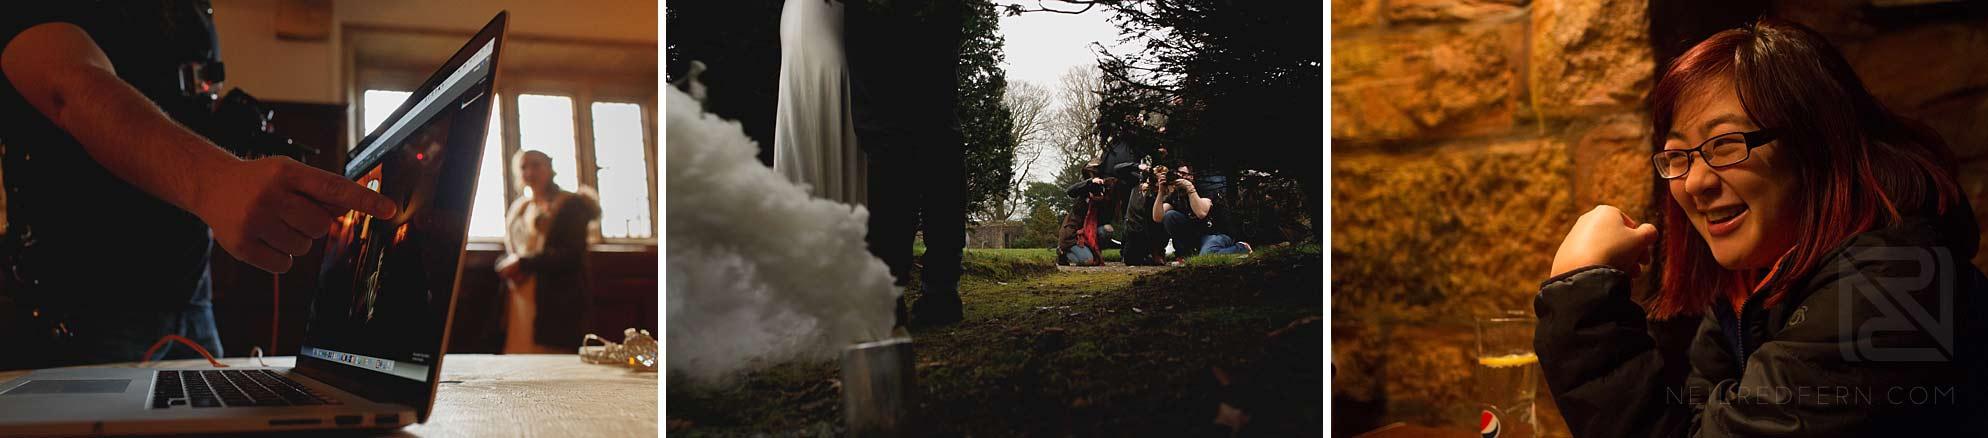 behind-the-scene-photograph-Neil-Redfern-workshop-04